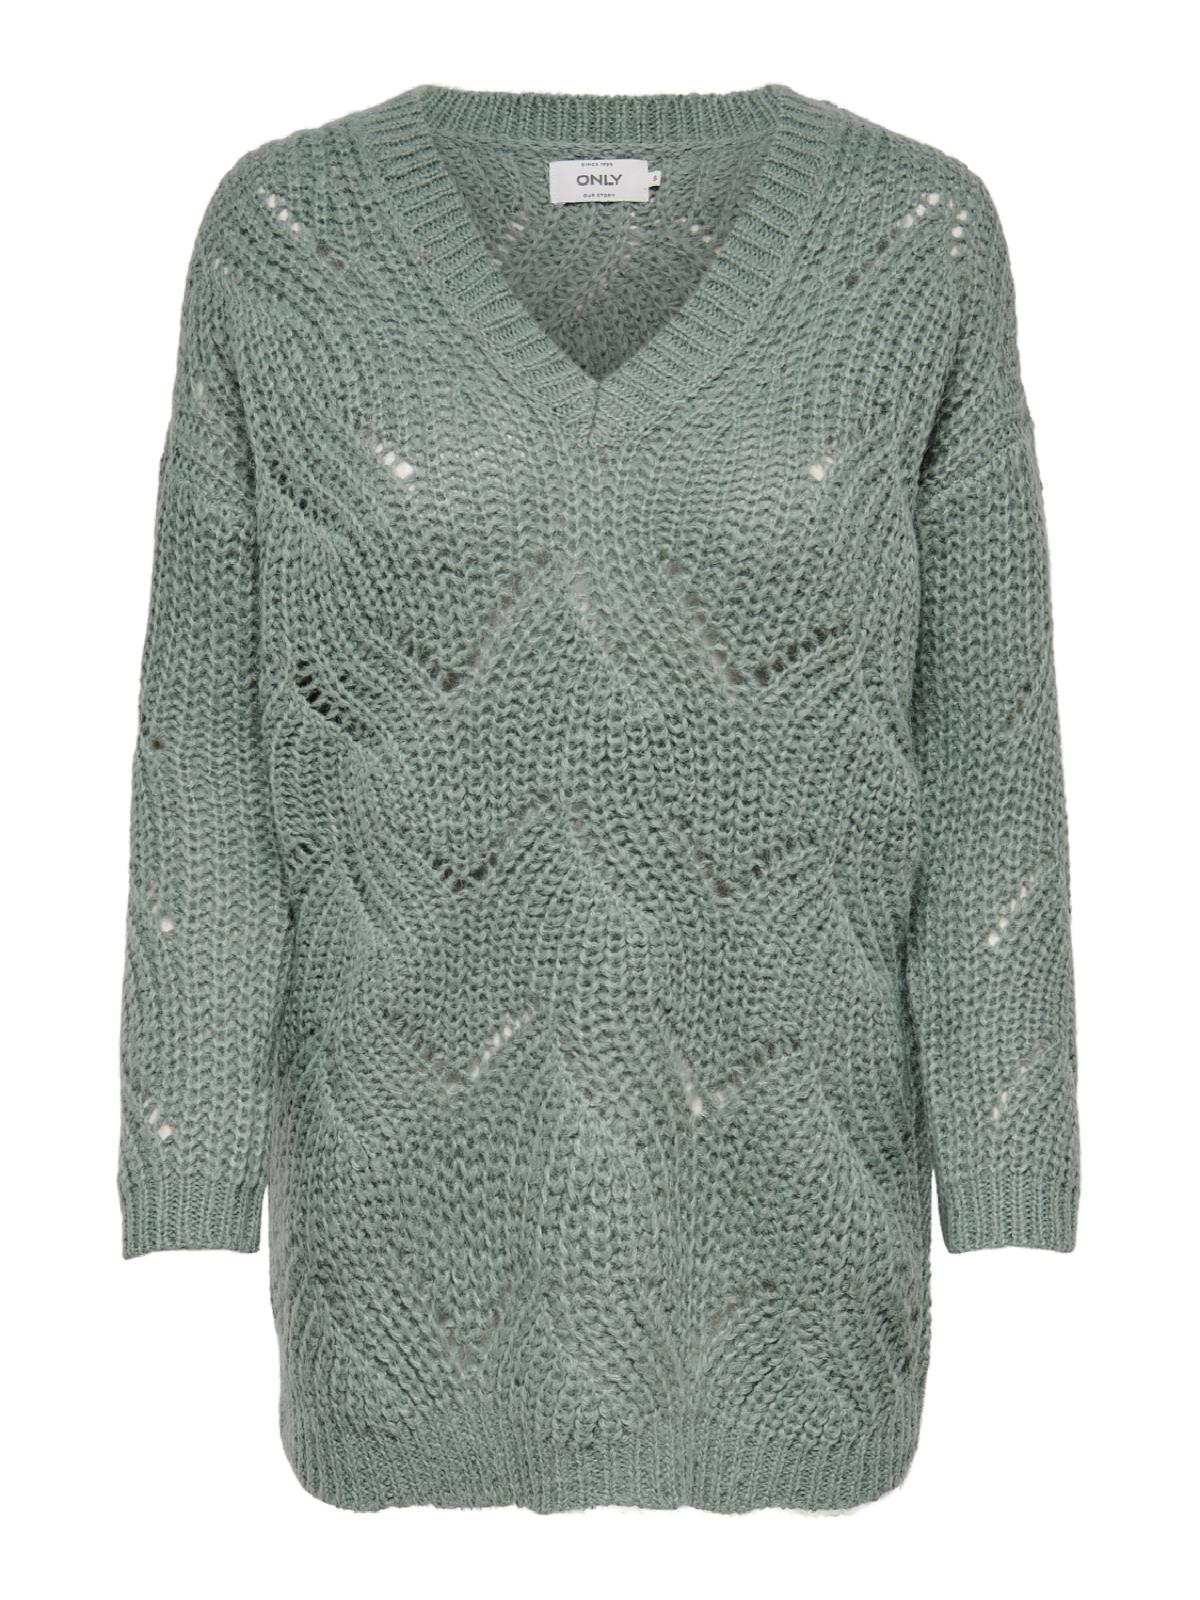 new arrival 1666b 2beb0 Only Damen langer grob Strick Sweater onlHavana L/S Pullover ...